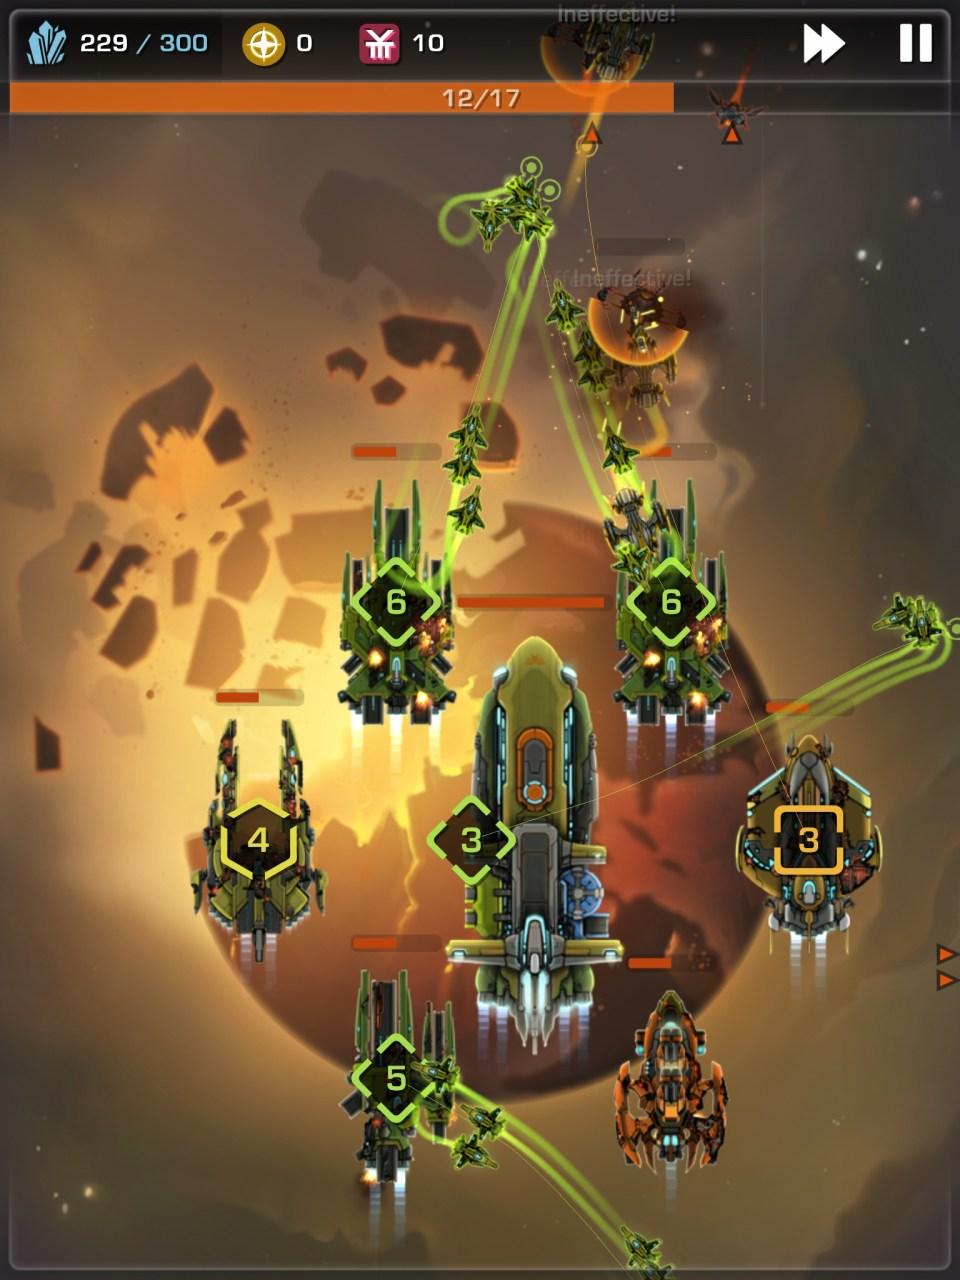 strikefleet-omega-game-thu-thanh-ket-hop-chien-thuat-thoi-gian-thuc 3